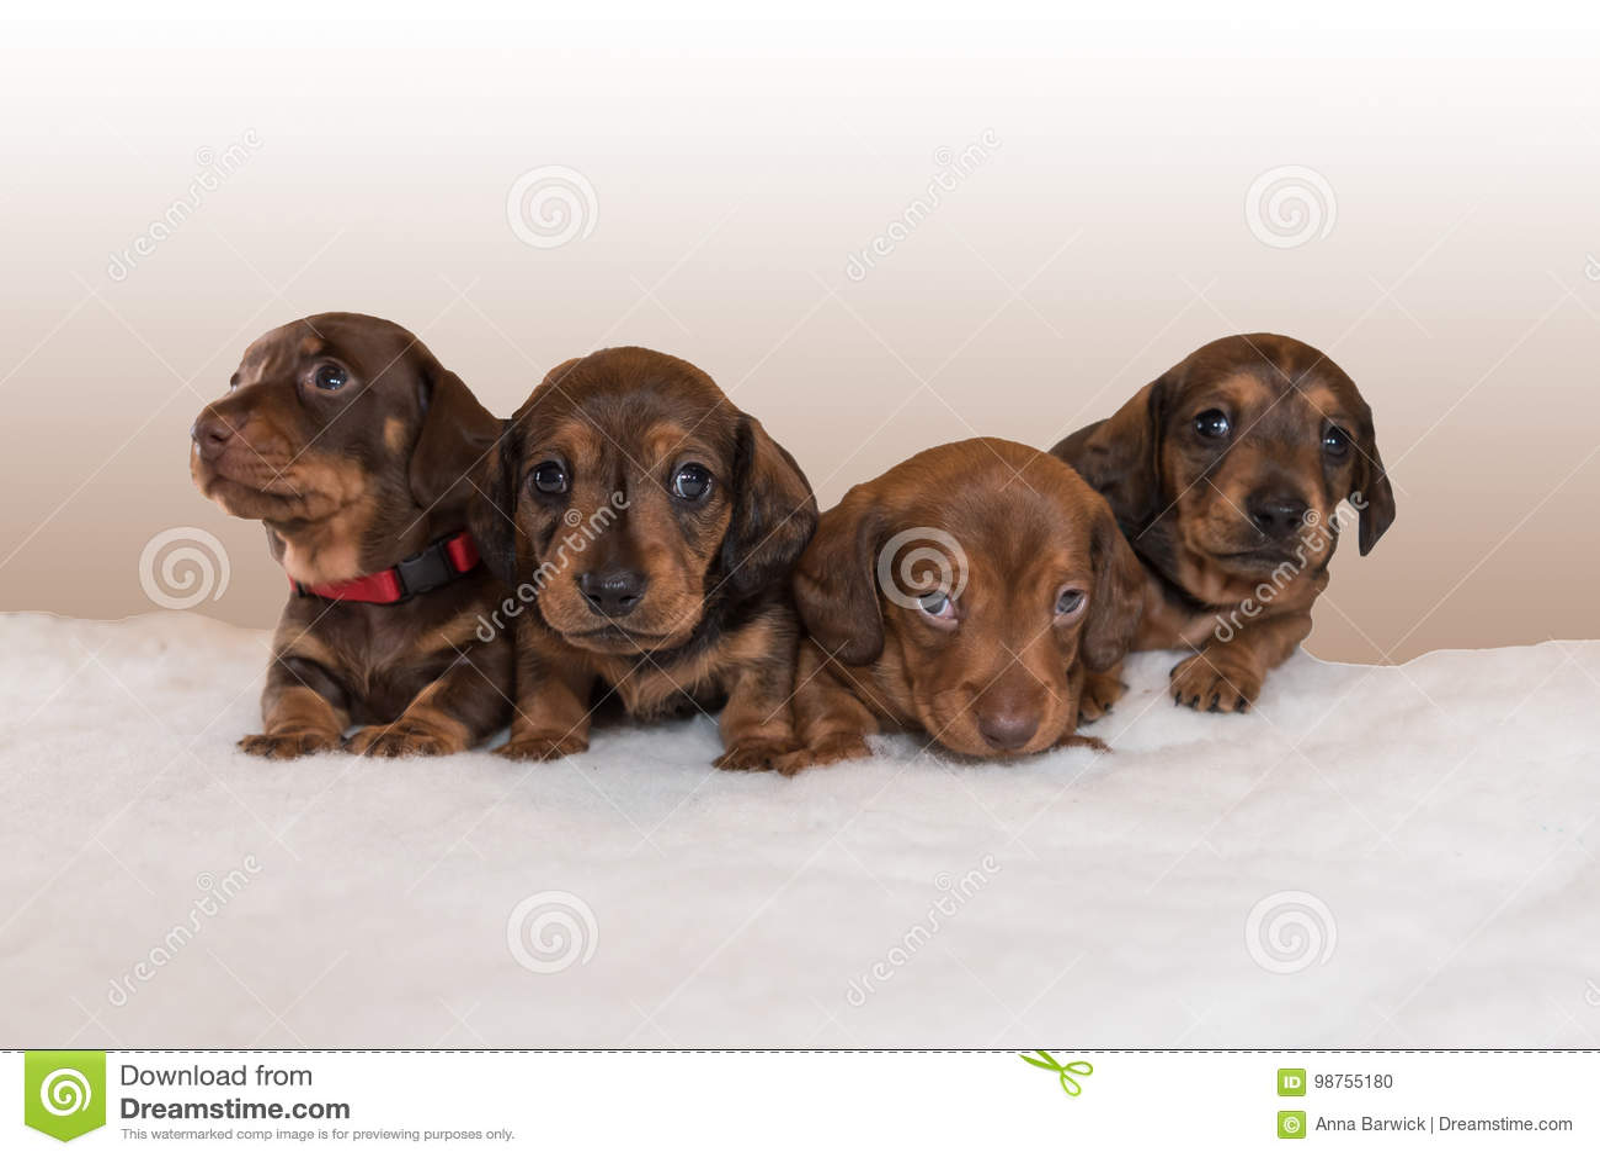 Miniature Dachshund Puppies On Fluffy White Blanket Stock